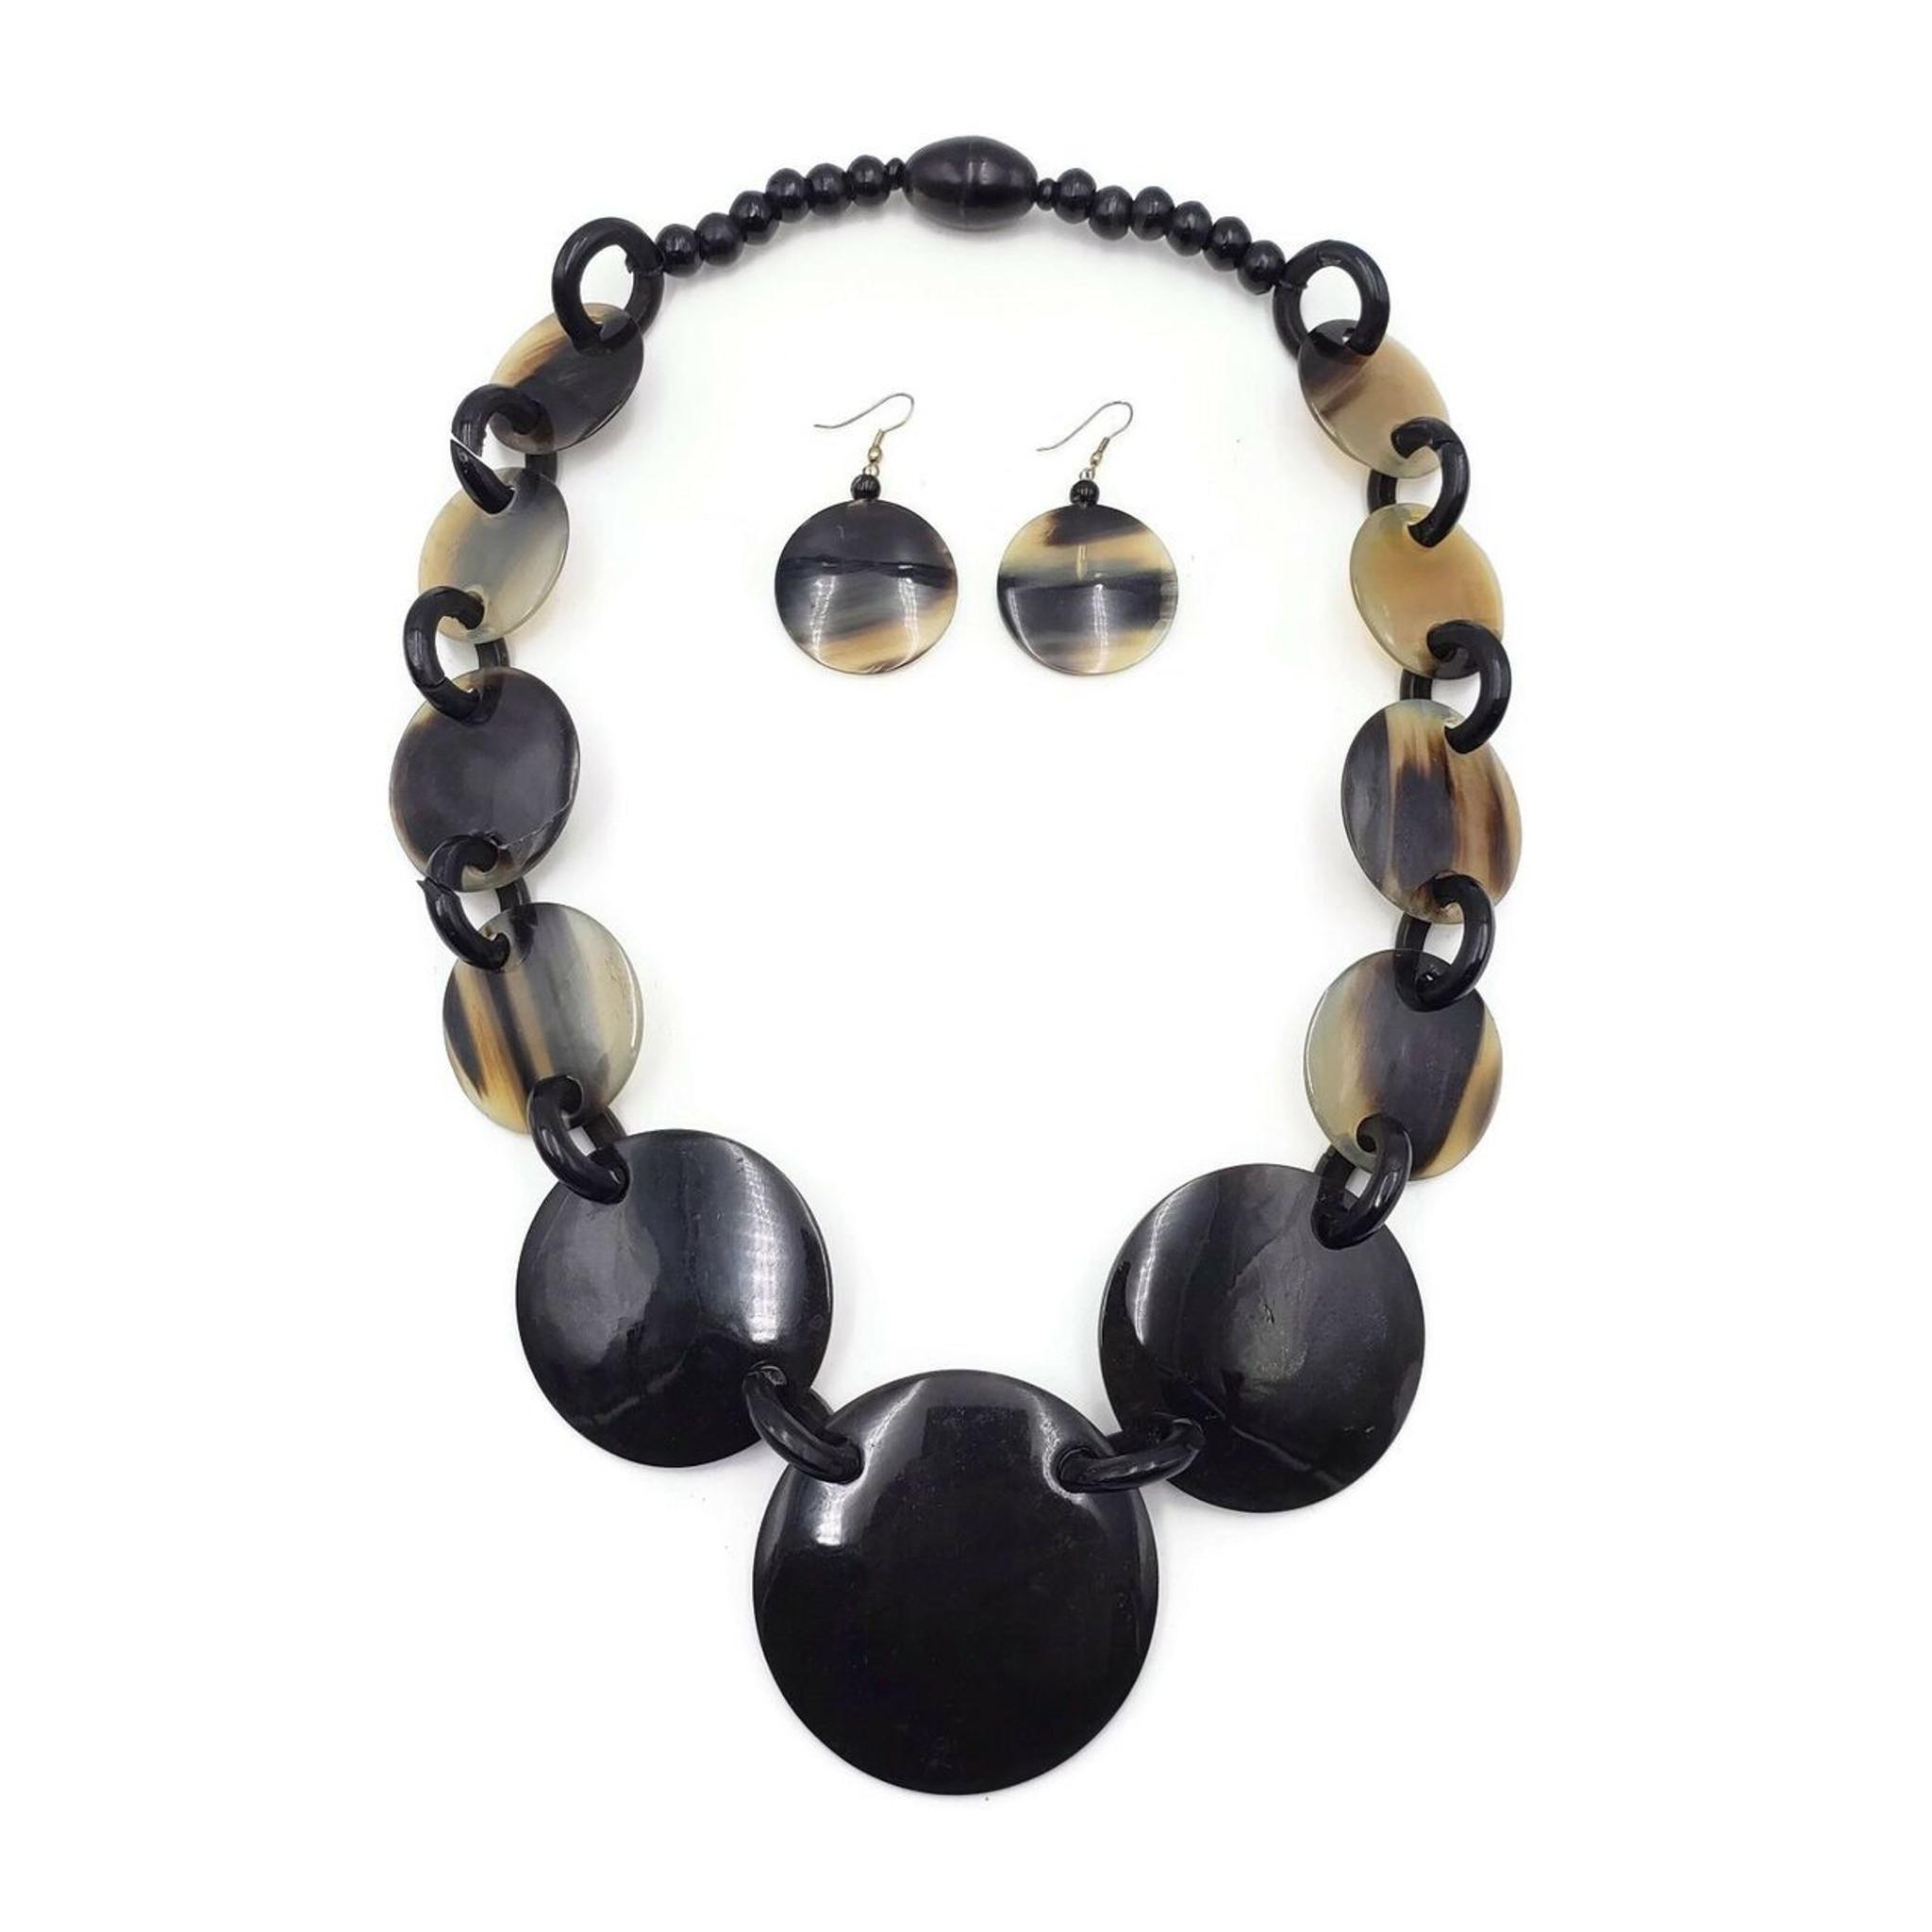 Agatha Horn / Bone Disks Necklace and Earrings Set